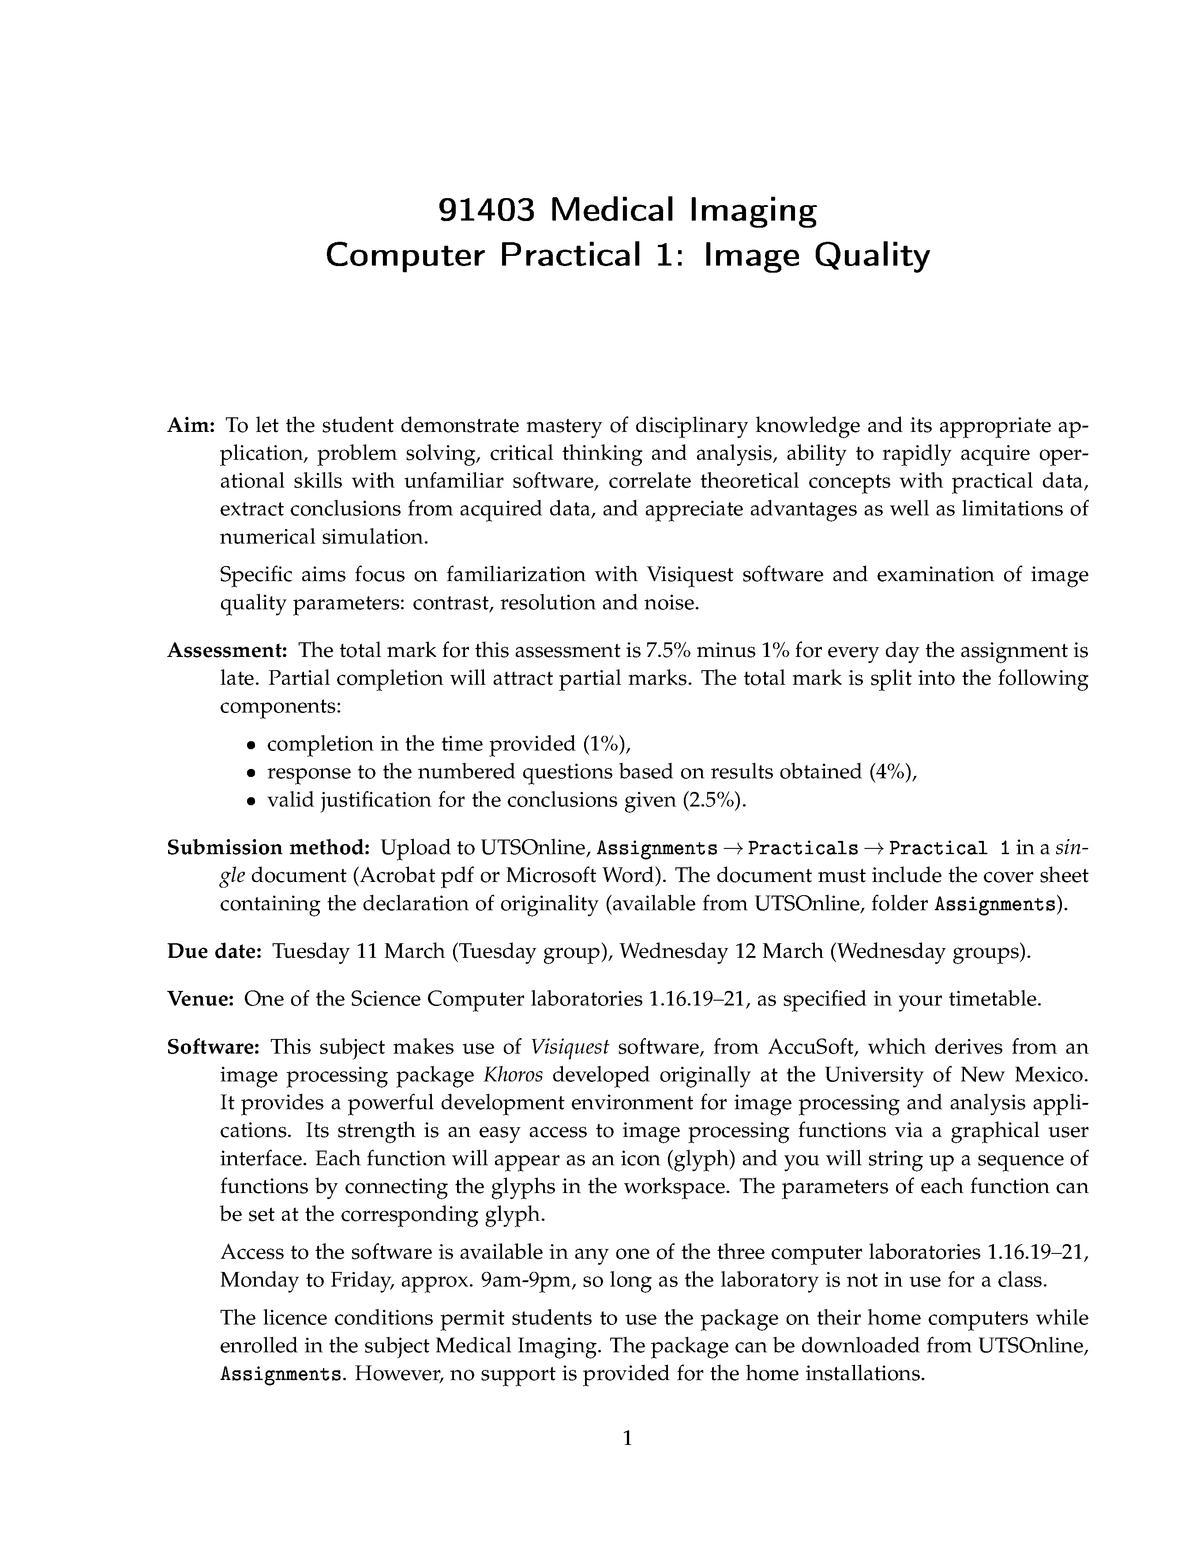 Image Quality practical 1 rulling - 091403 : Medical Imaging - StuDocu